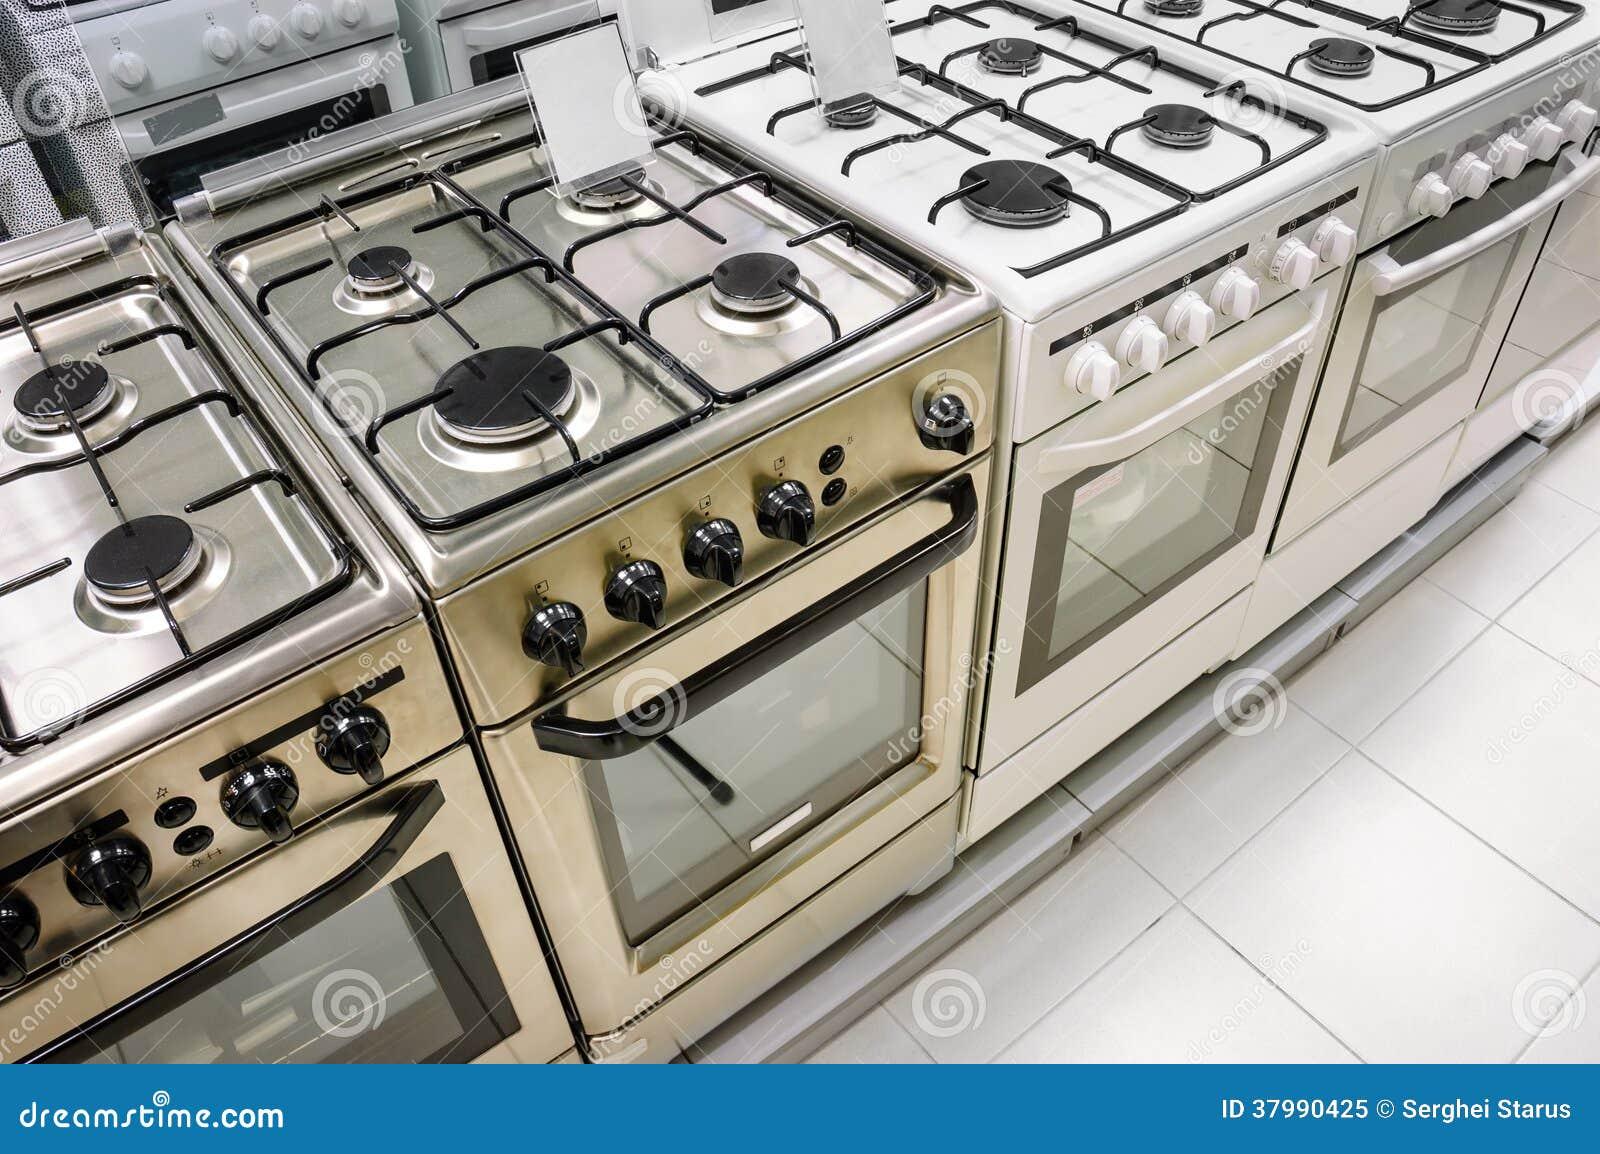 magasin d 39 appareil m nager rang e des cuisini res gaz photo libre de droits image 37990425. Black Bedroom Furniture Sets. Home Design Ideas